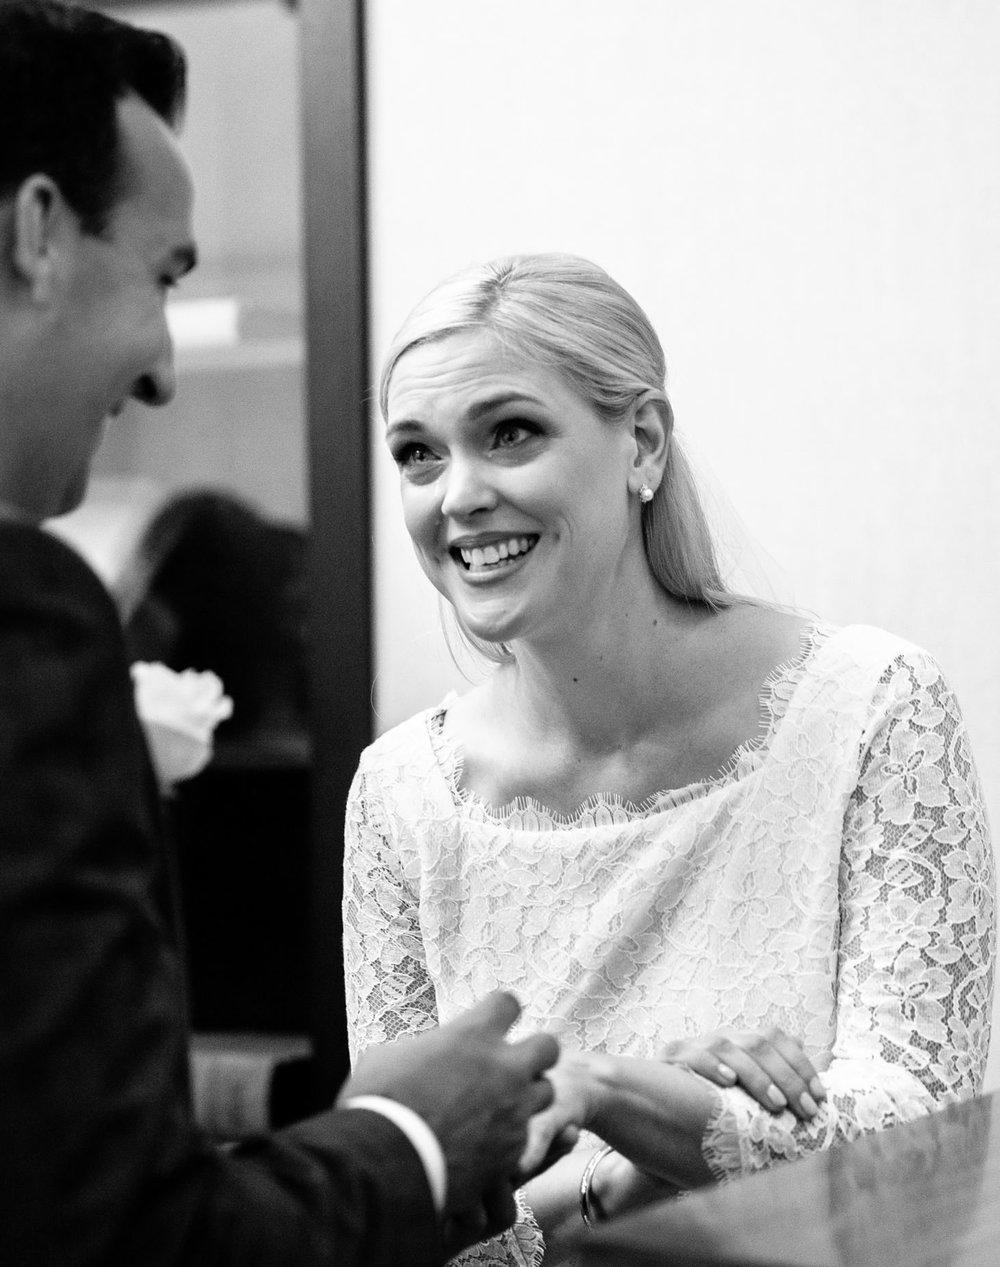 nyc-wedding-photographer-city-hall-elopement-smitten-chickens-city-hall-wedding002.jpg